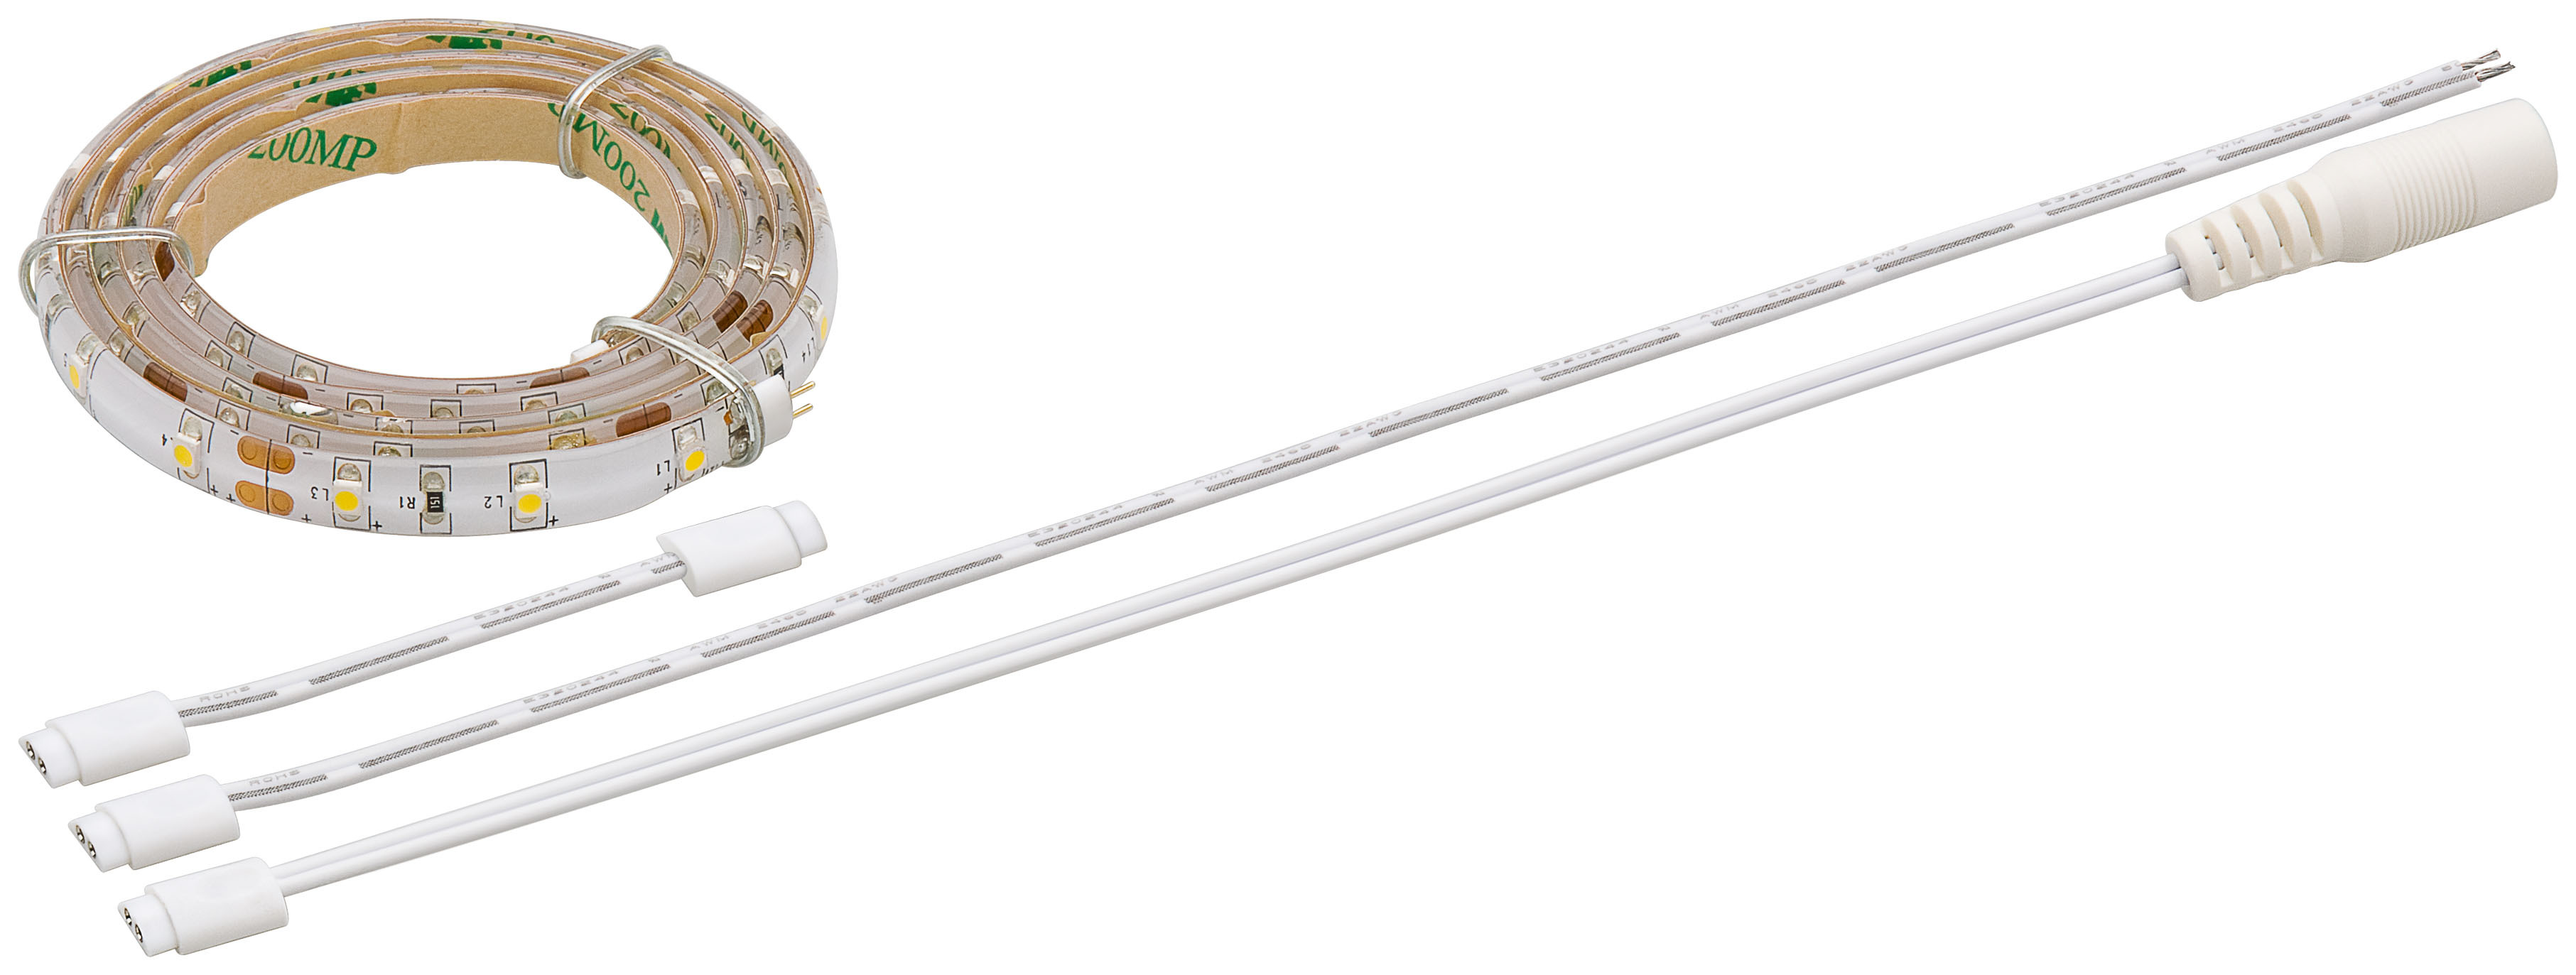 flexible led lichtleiste in ambient wei 0 5 m led leiste flex sb 30 smd ambien ebay. Black Bedroom Furniture Sets. Home Design Ideas